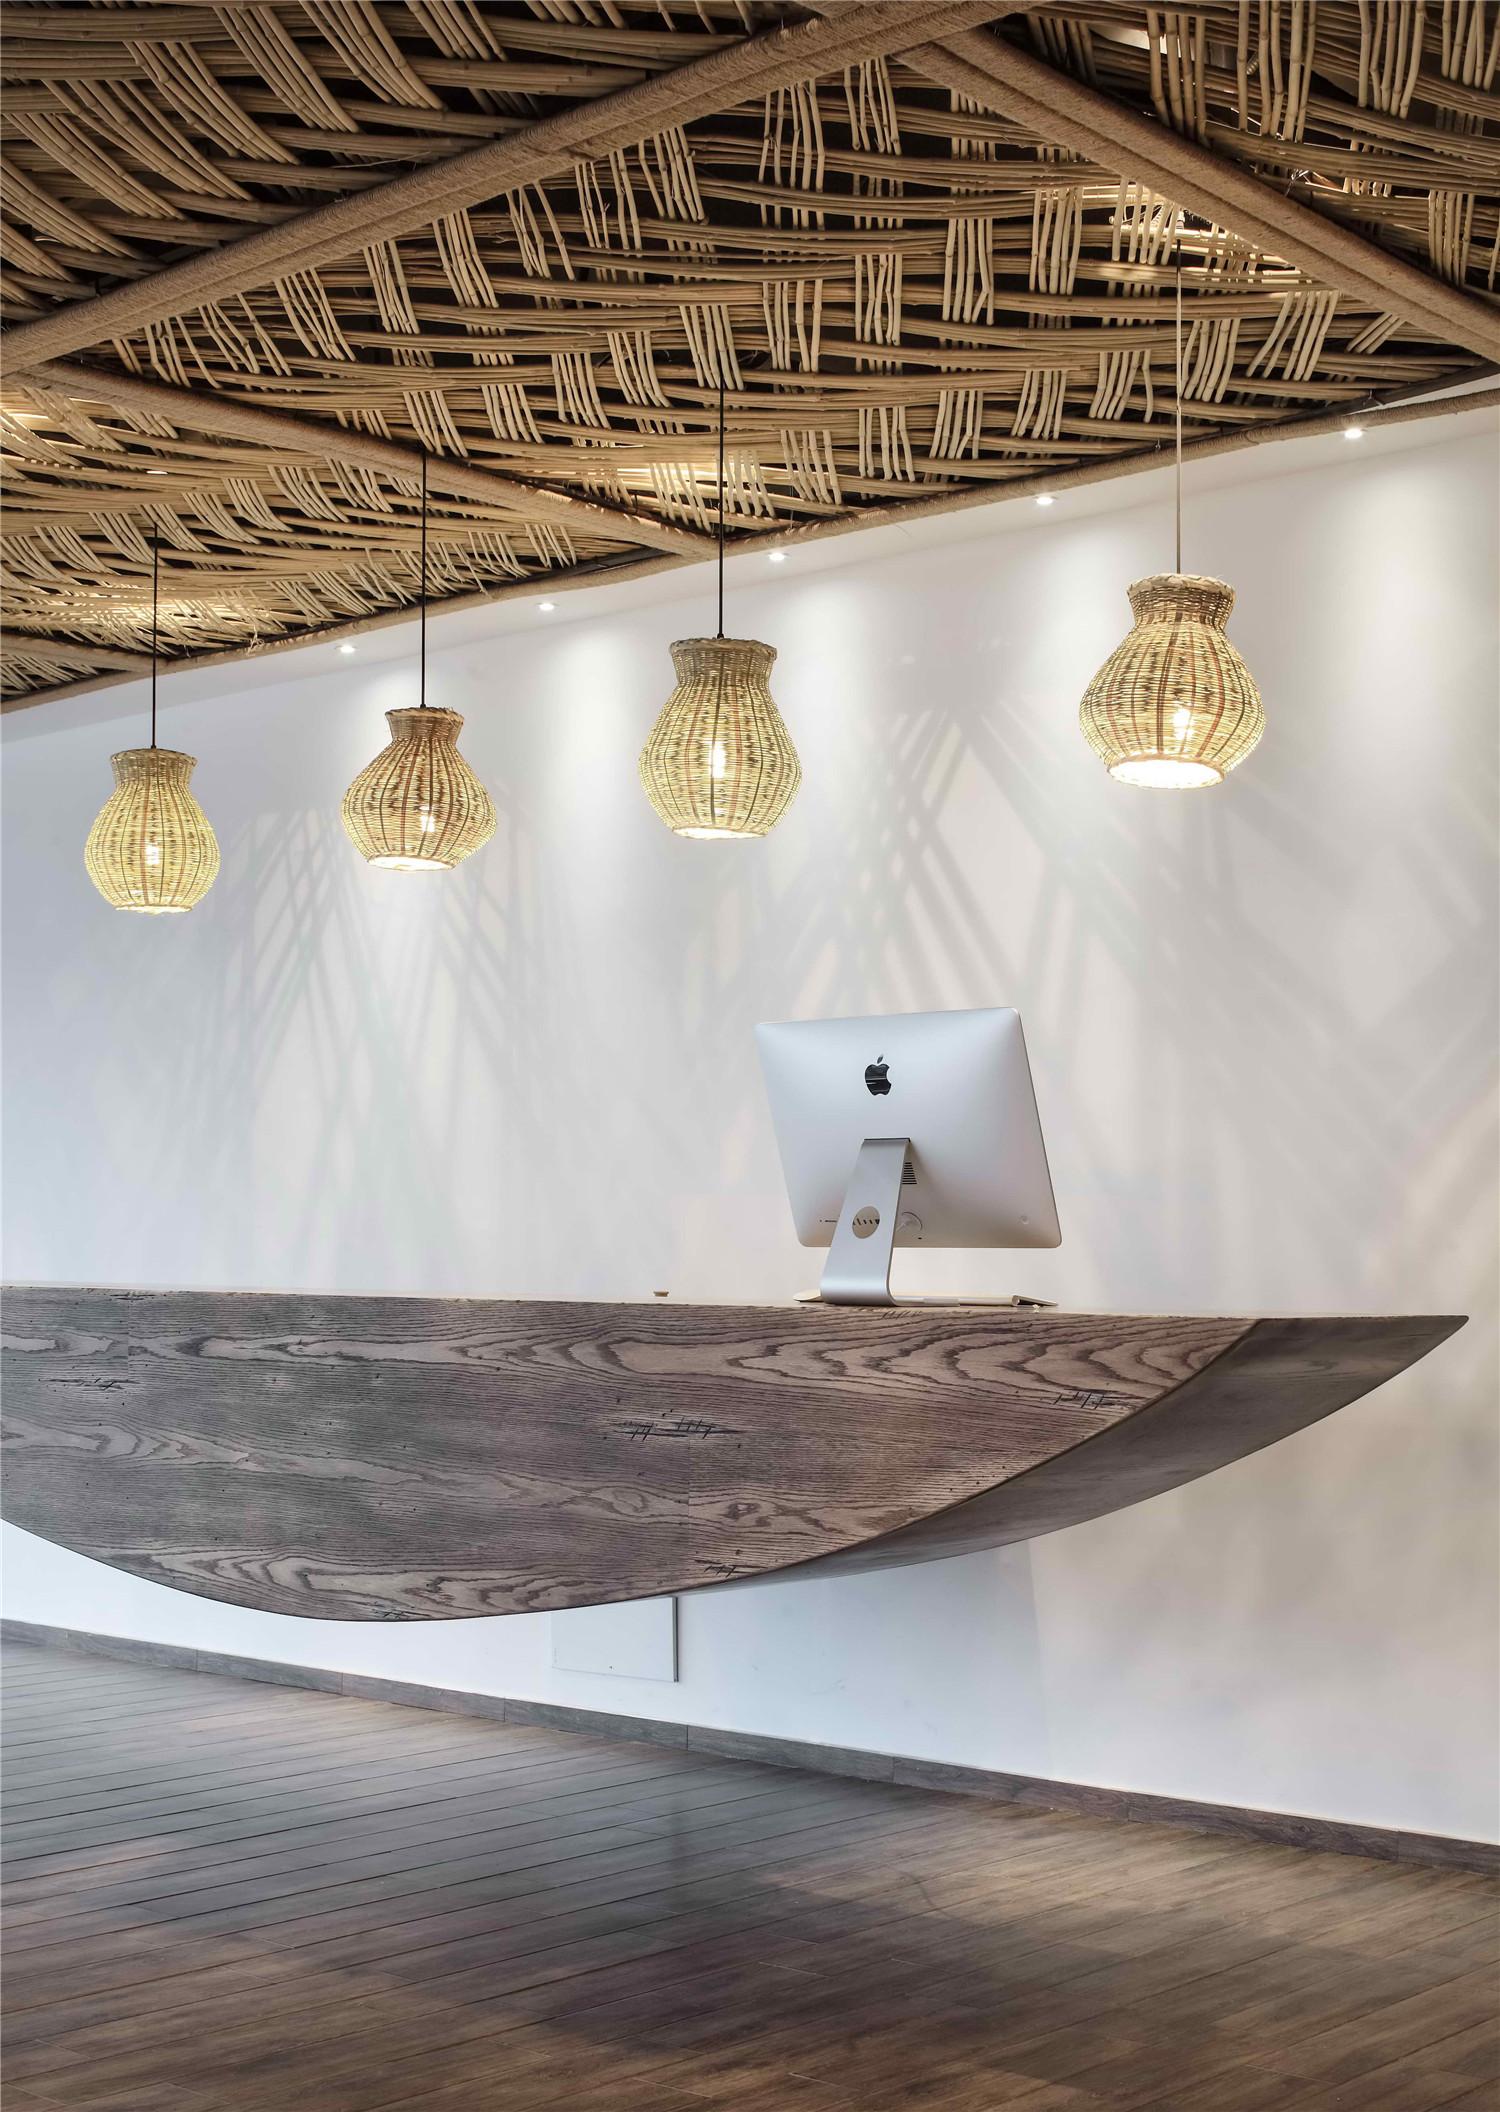 Ripple Hotel - Qiandao Lake design brief Hisheji (10)